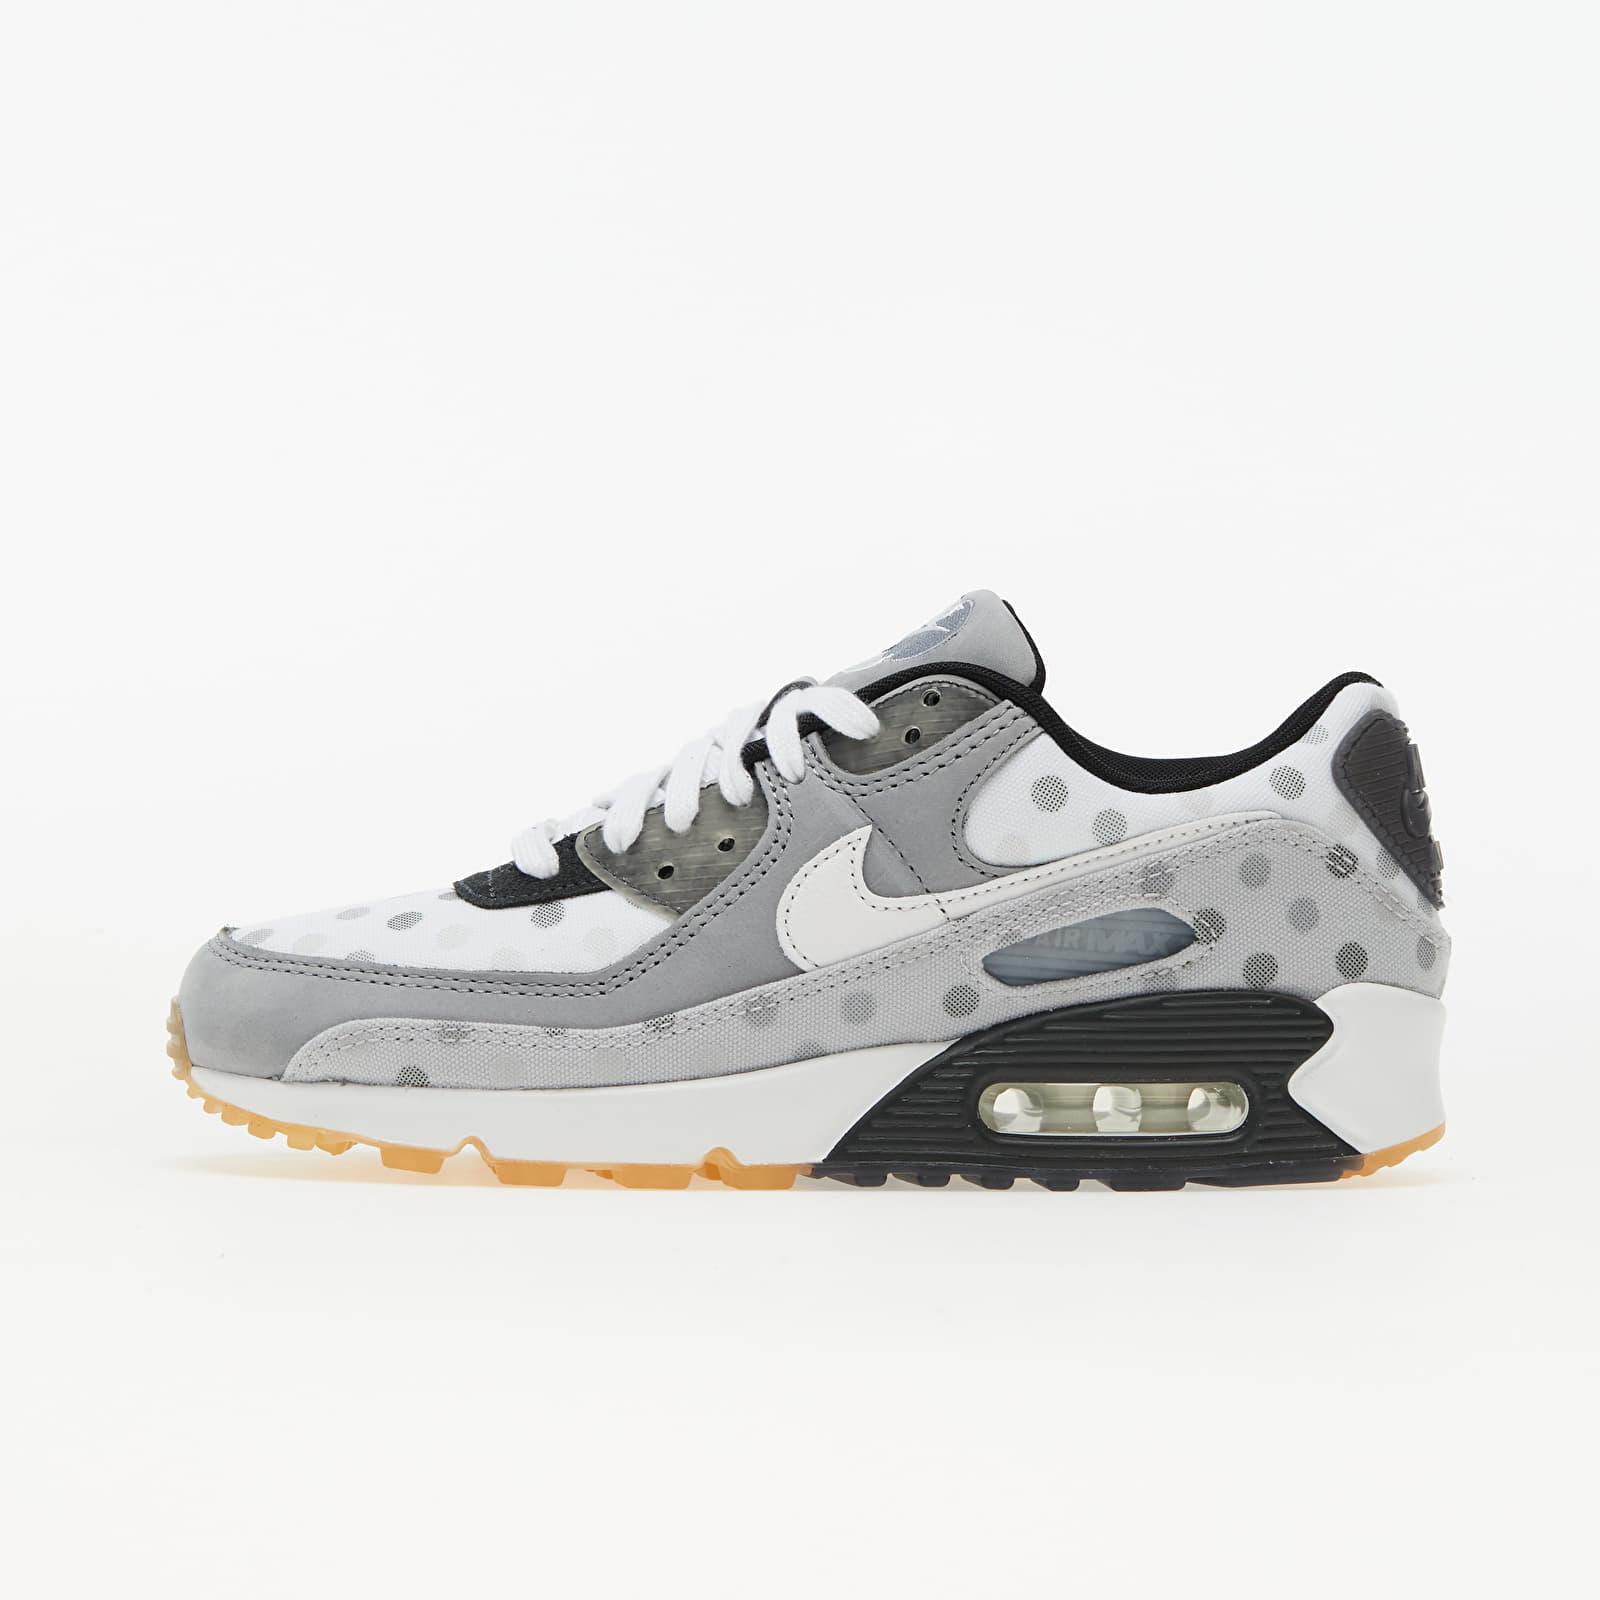 Nike Air Max 90 NRG Summit White/ White-Grey Fog-Black EUR 45